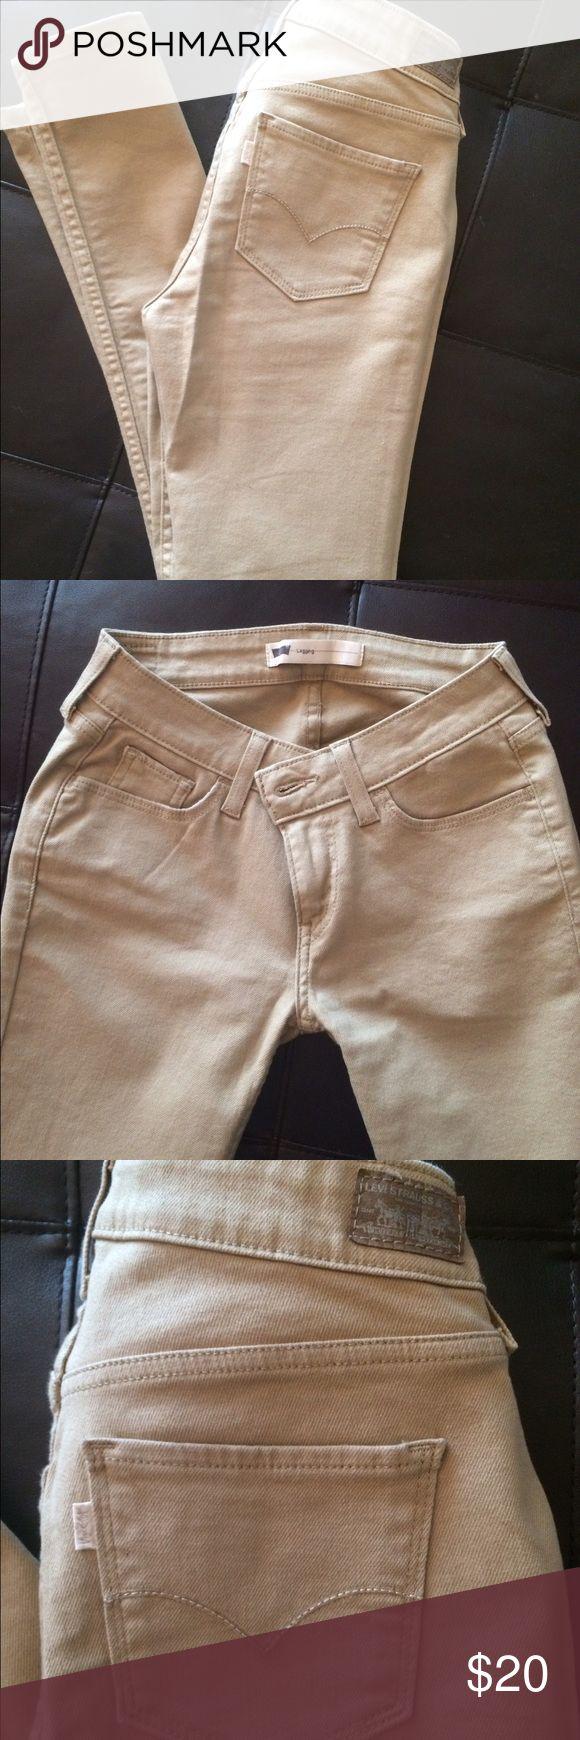 Jeans LEVYS leggins brand NEW!!!! ✨✨ Levi's Jeans Skinny